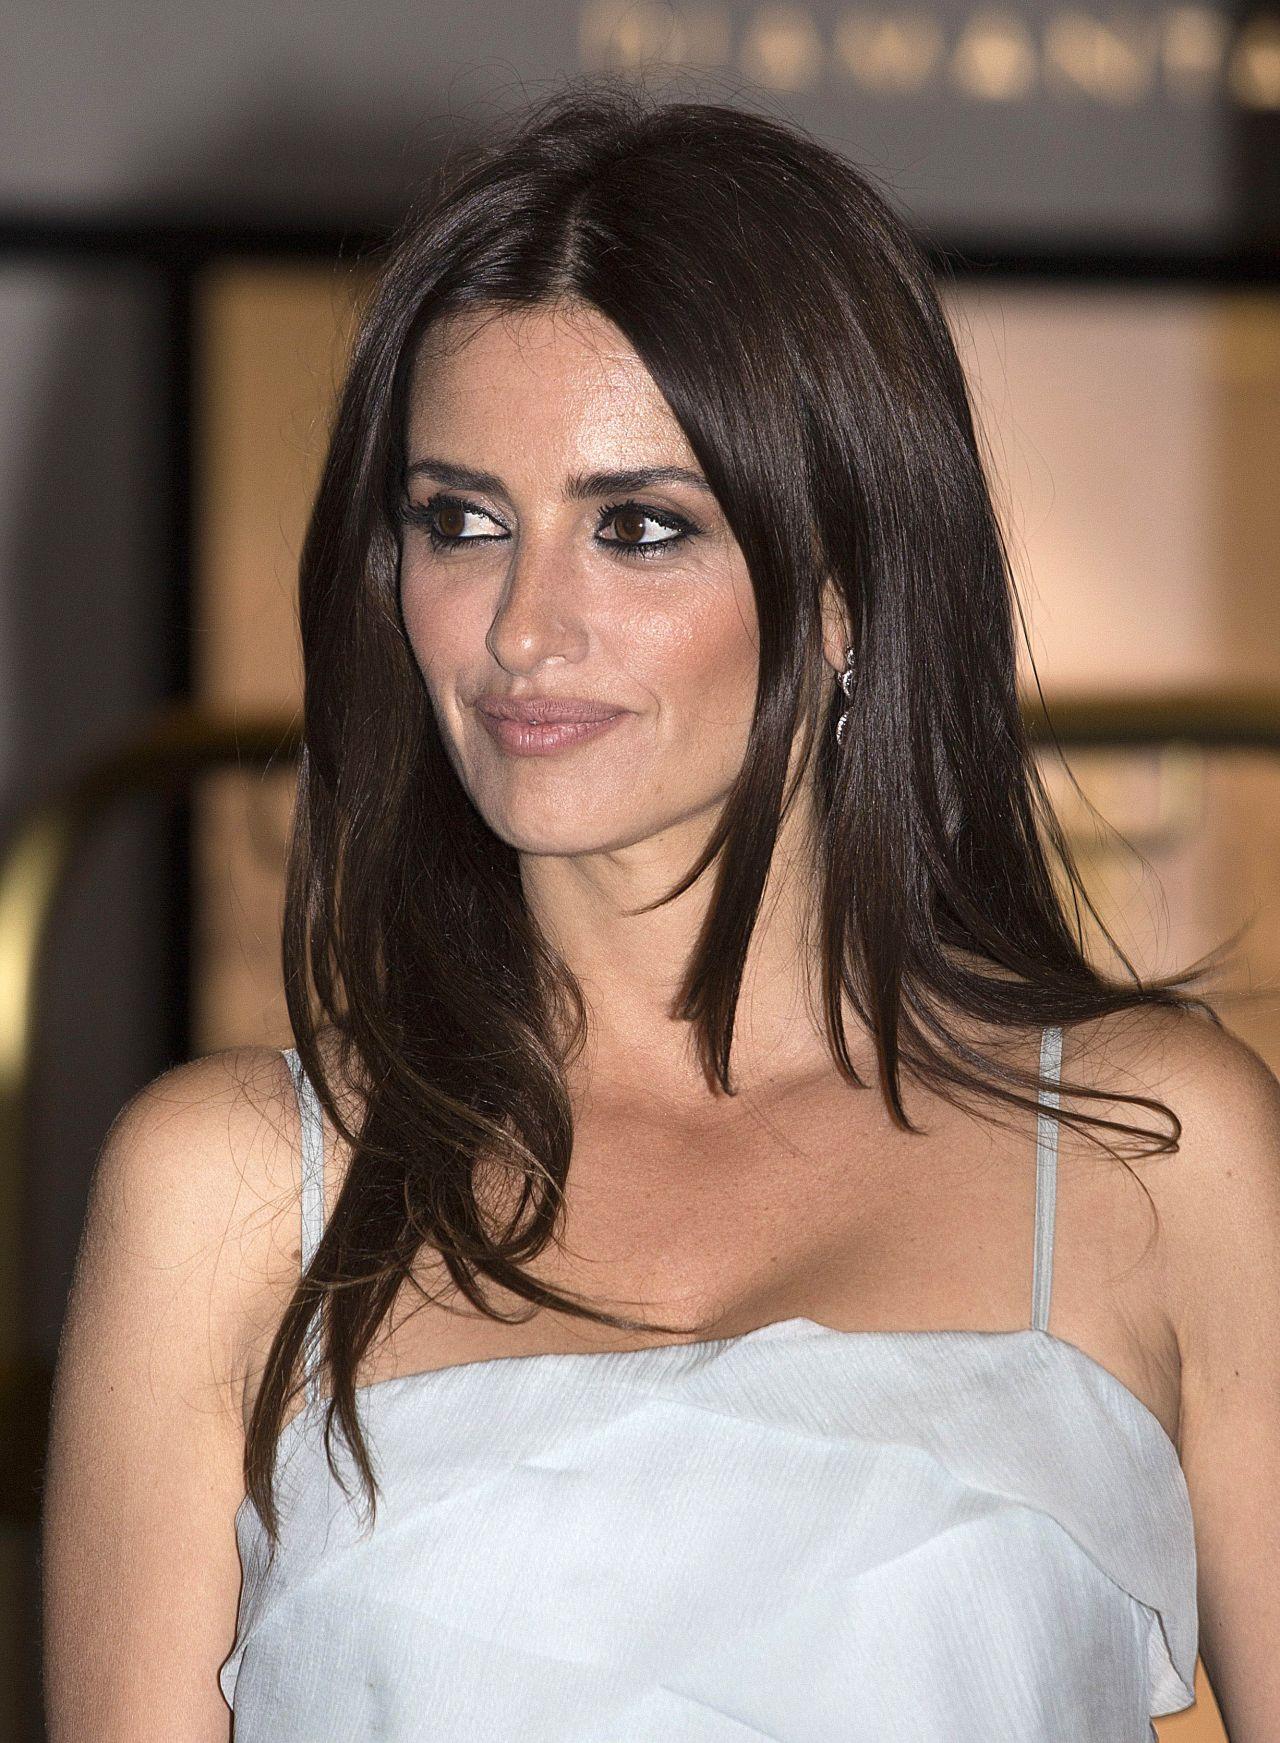 Penelope Cruz Chanel X Vanity Fair Party In Cannes 05 09